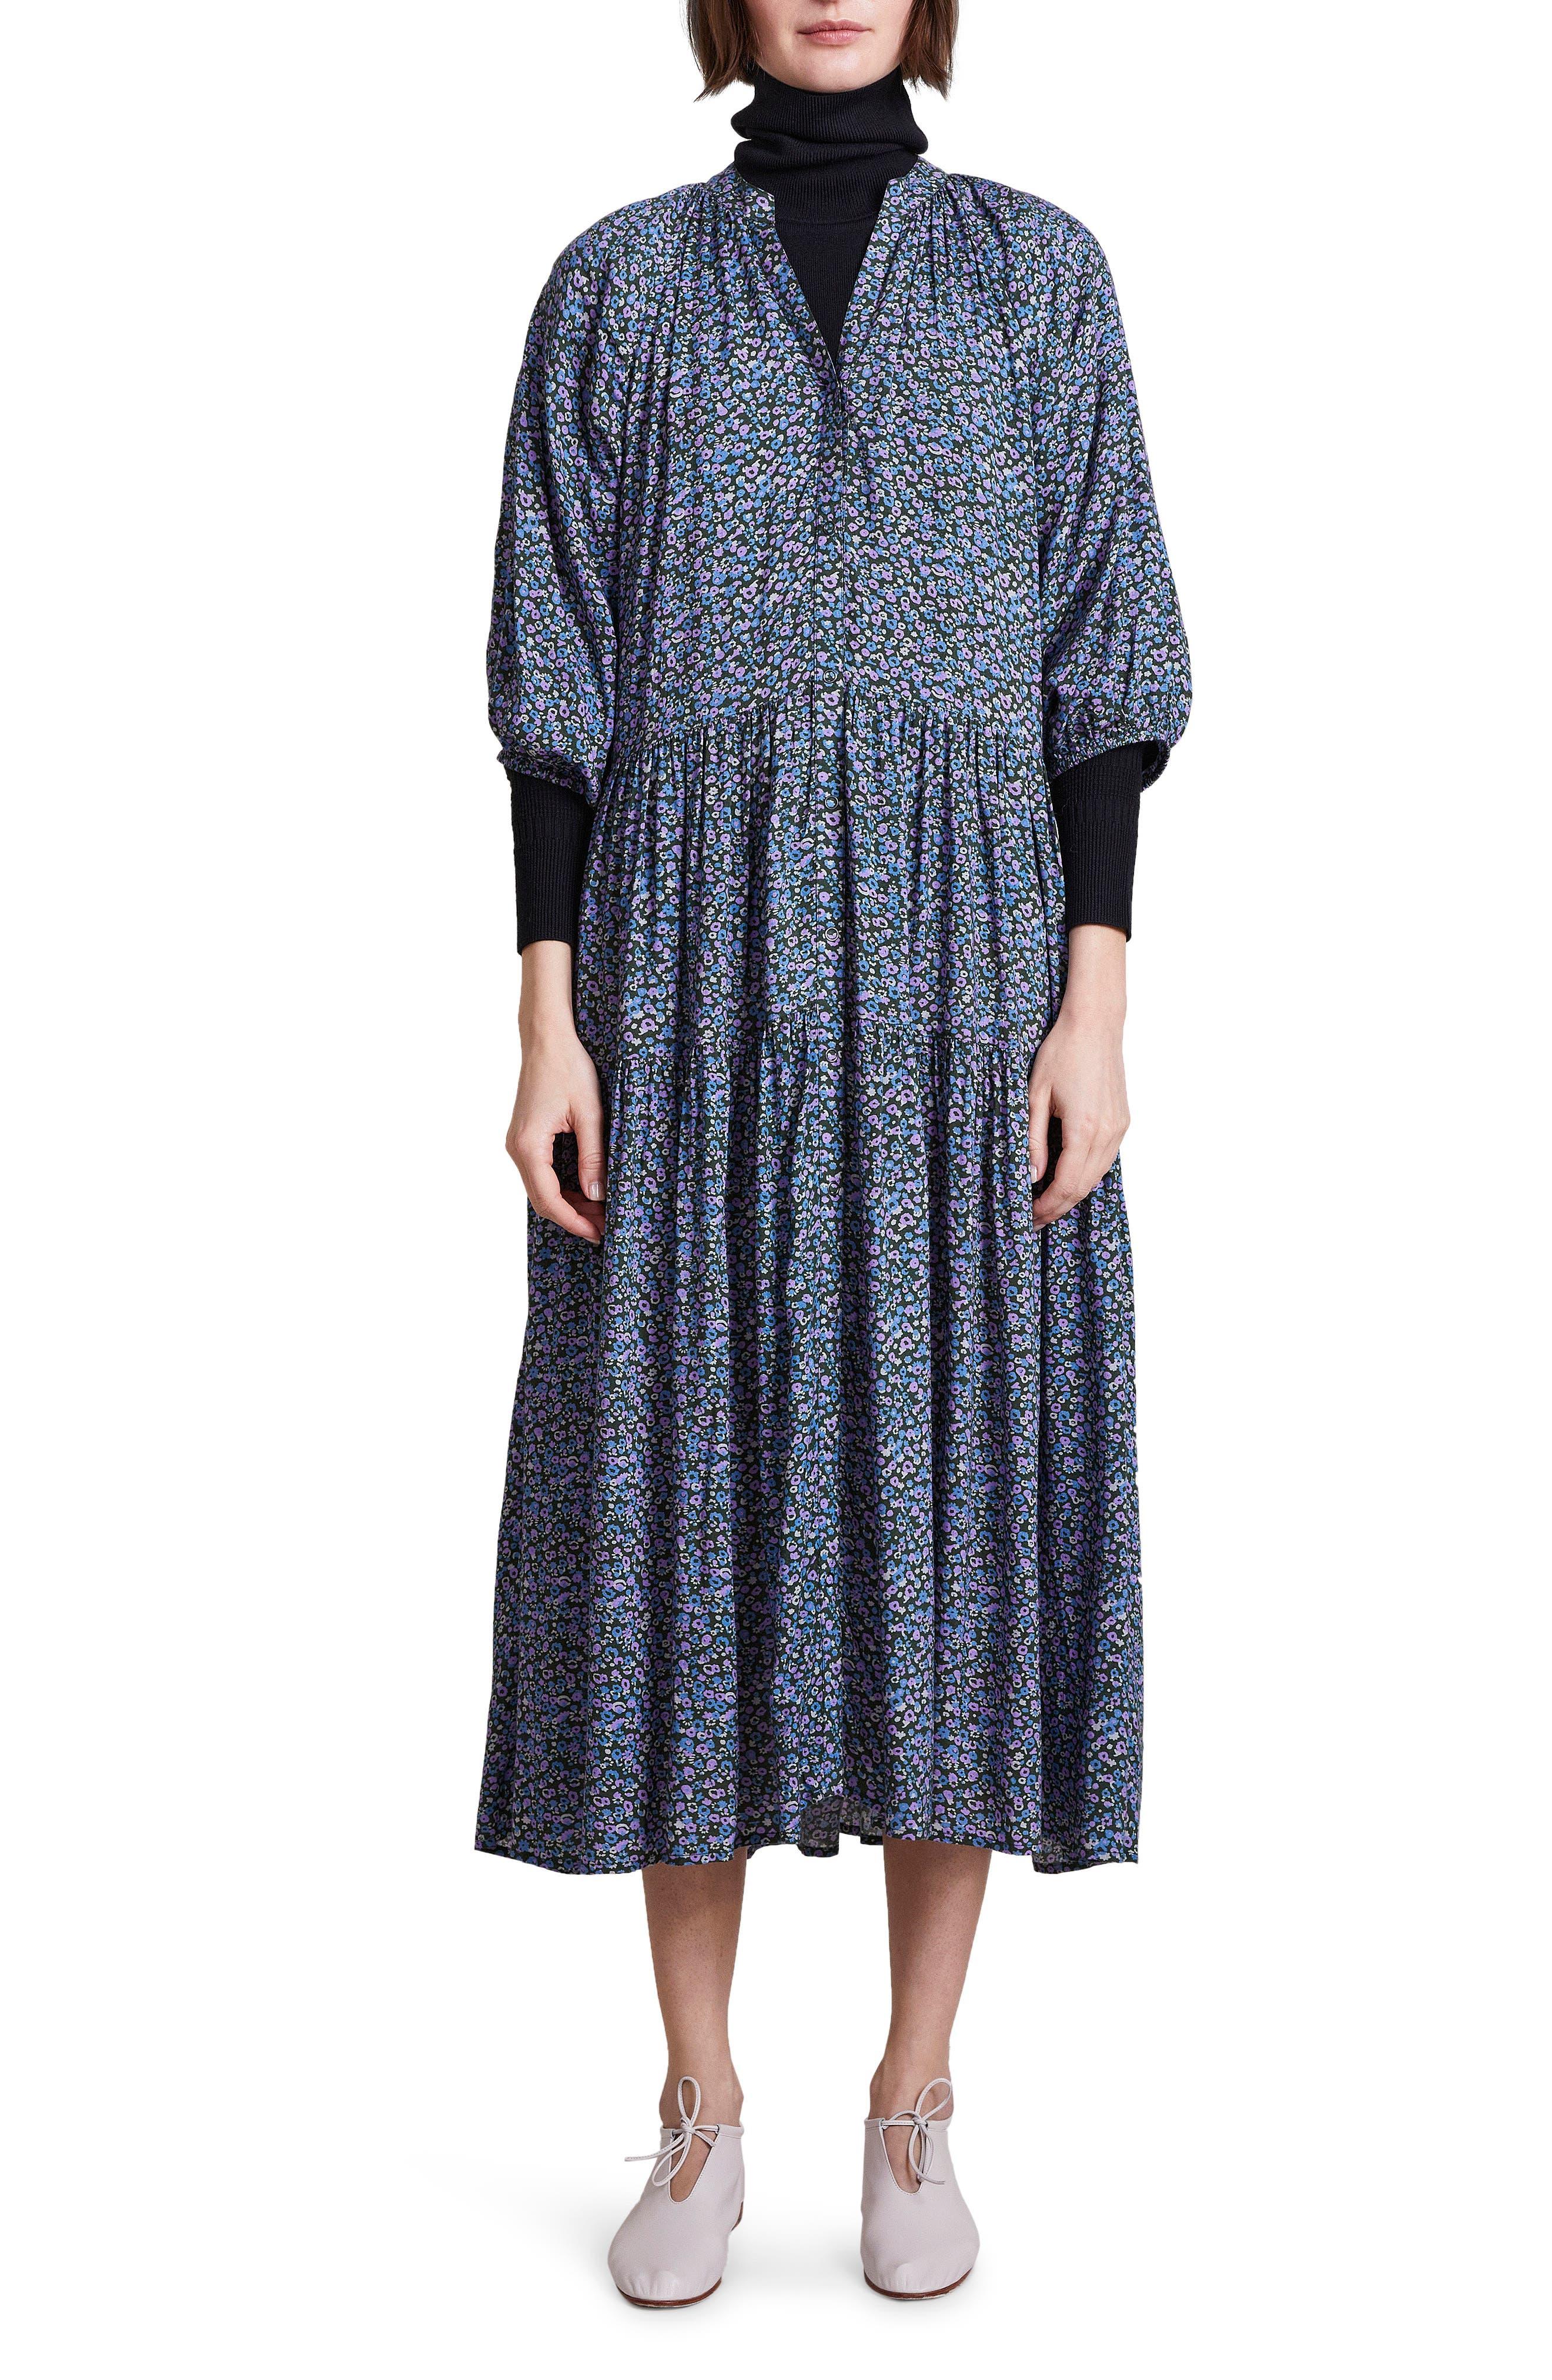 Mitte Floral Print Long Sleeve Cotton Dress